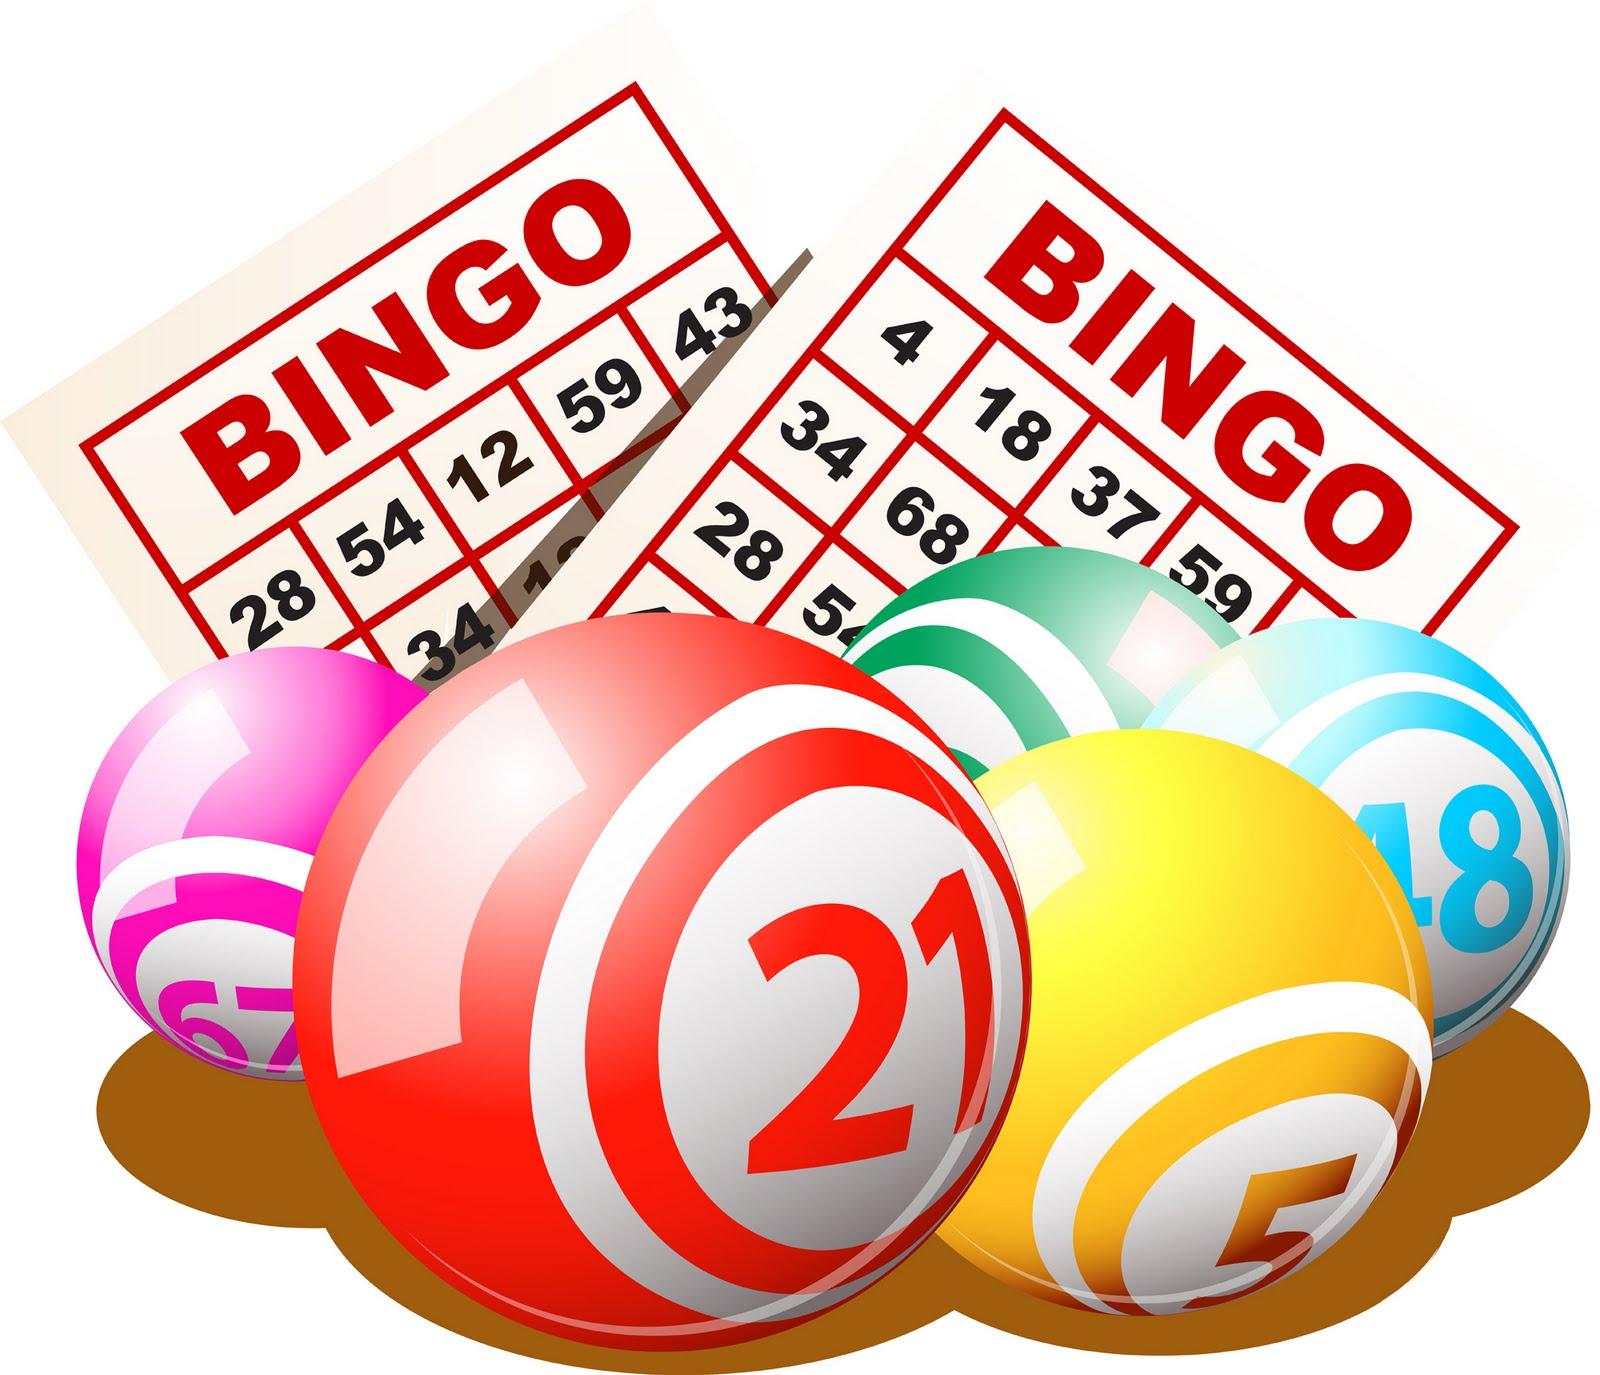 Bingo at the Office 11/10.